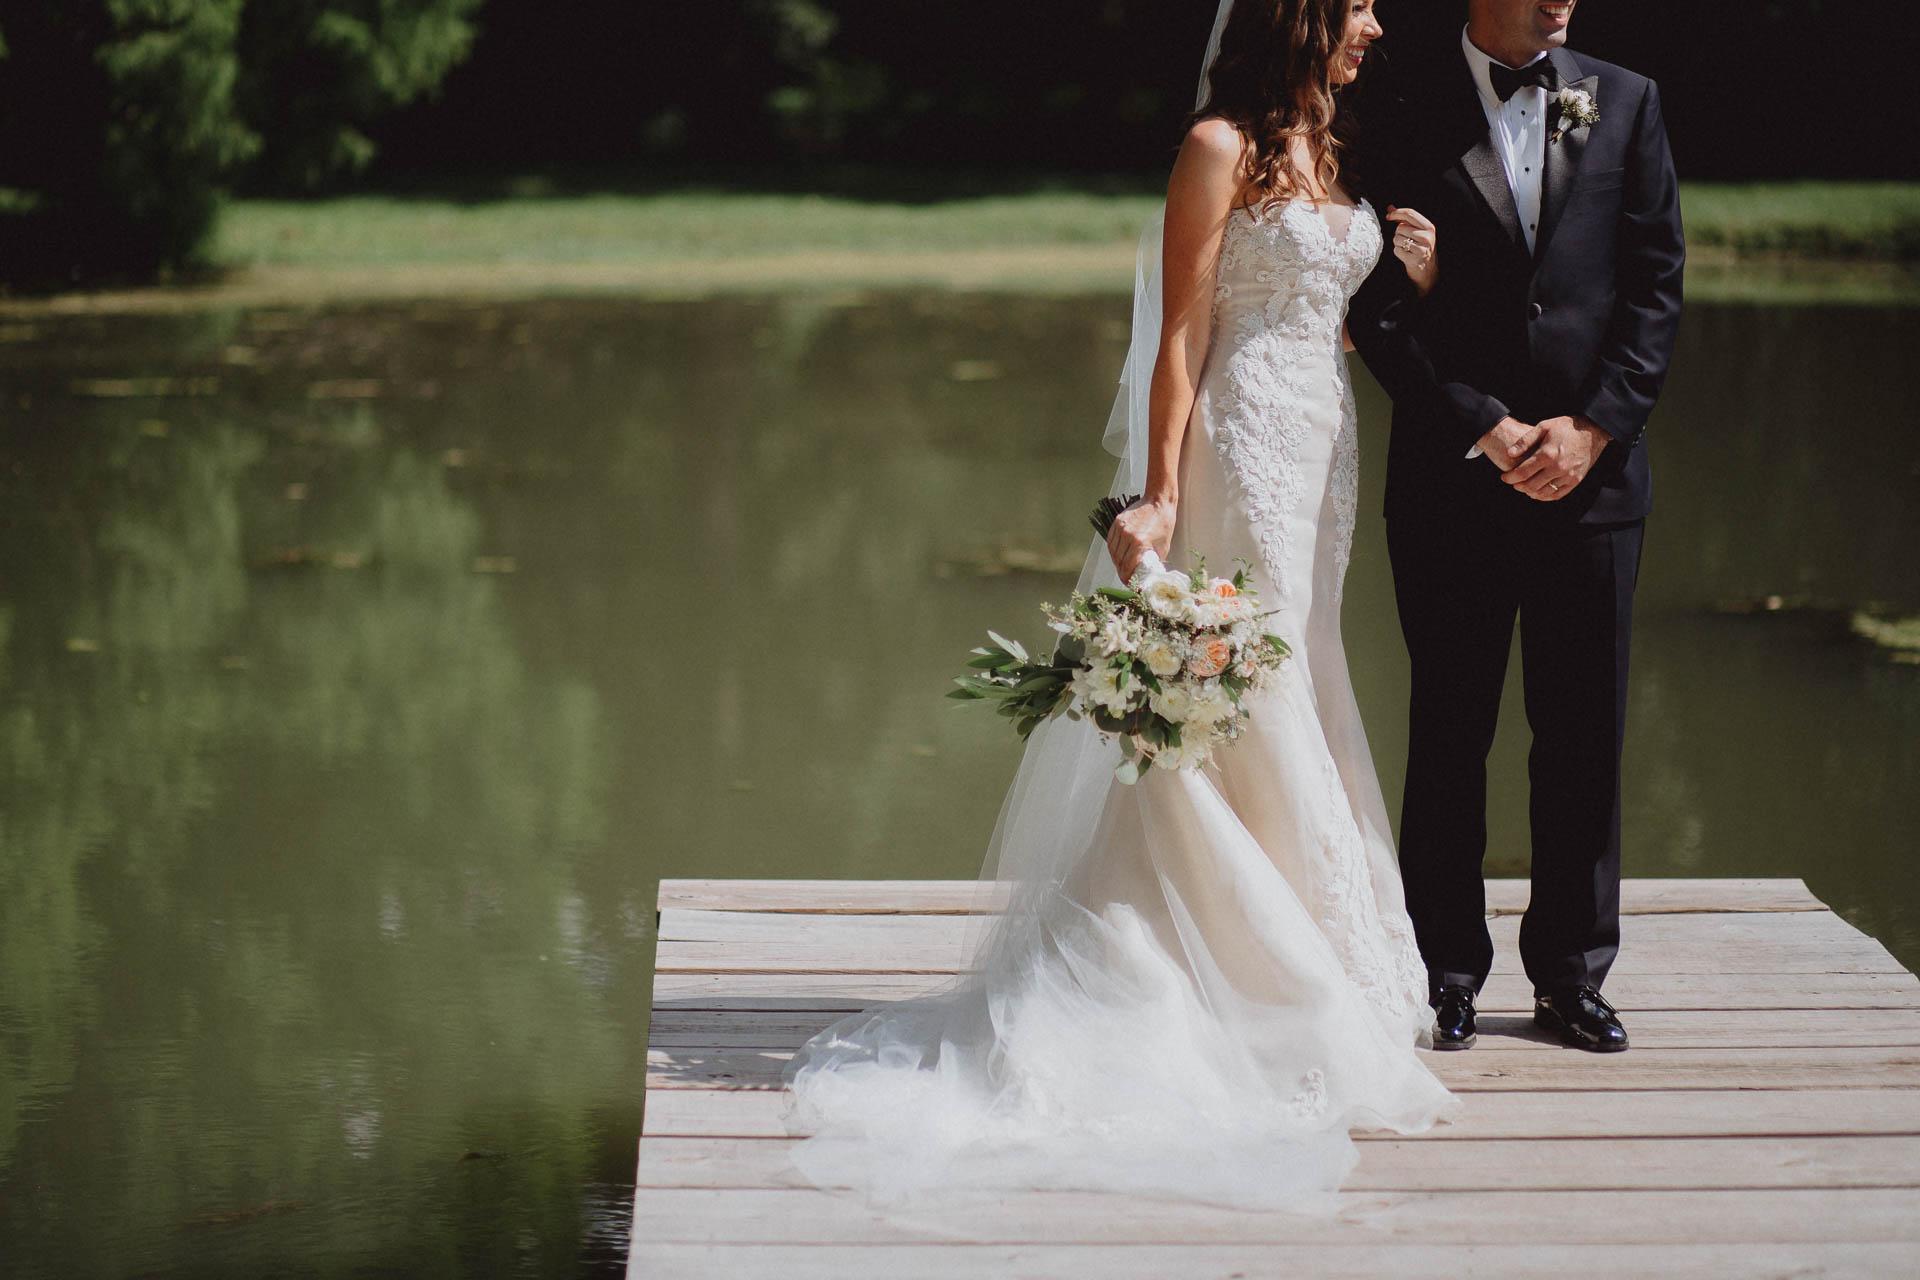 Keri-Joseph-Top-of-the-Market-Wedding-103@2x.jpg